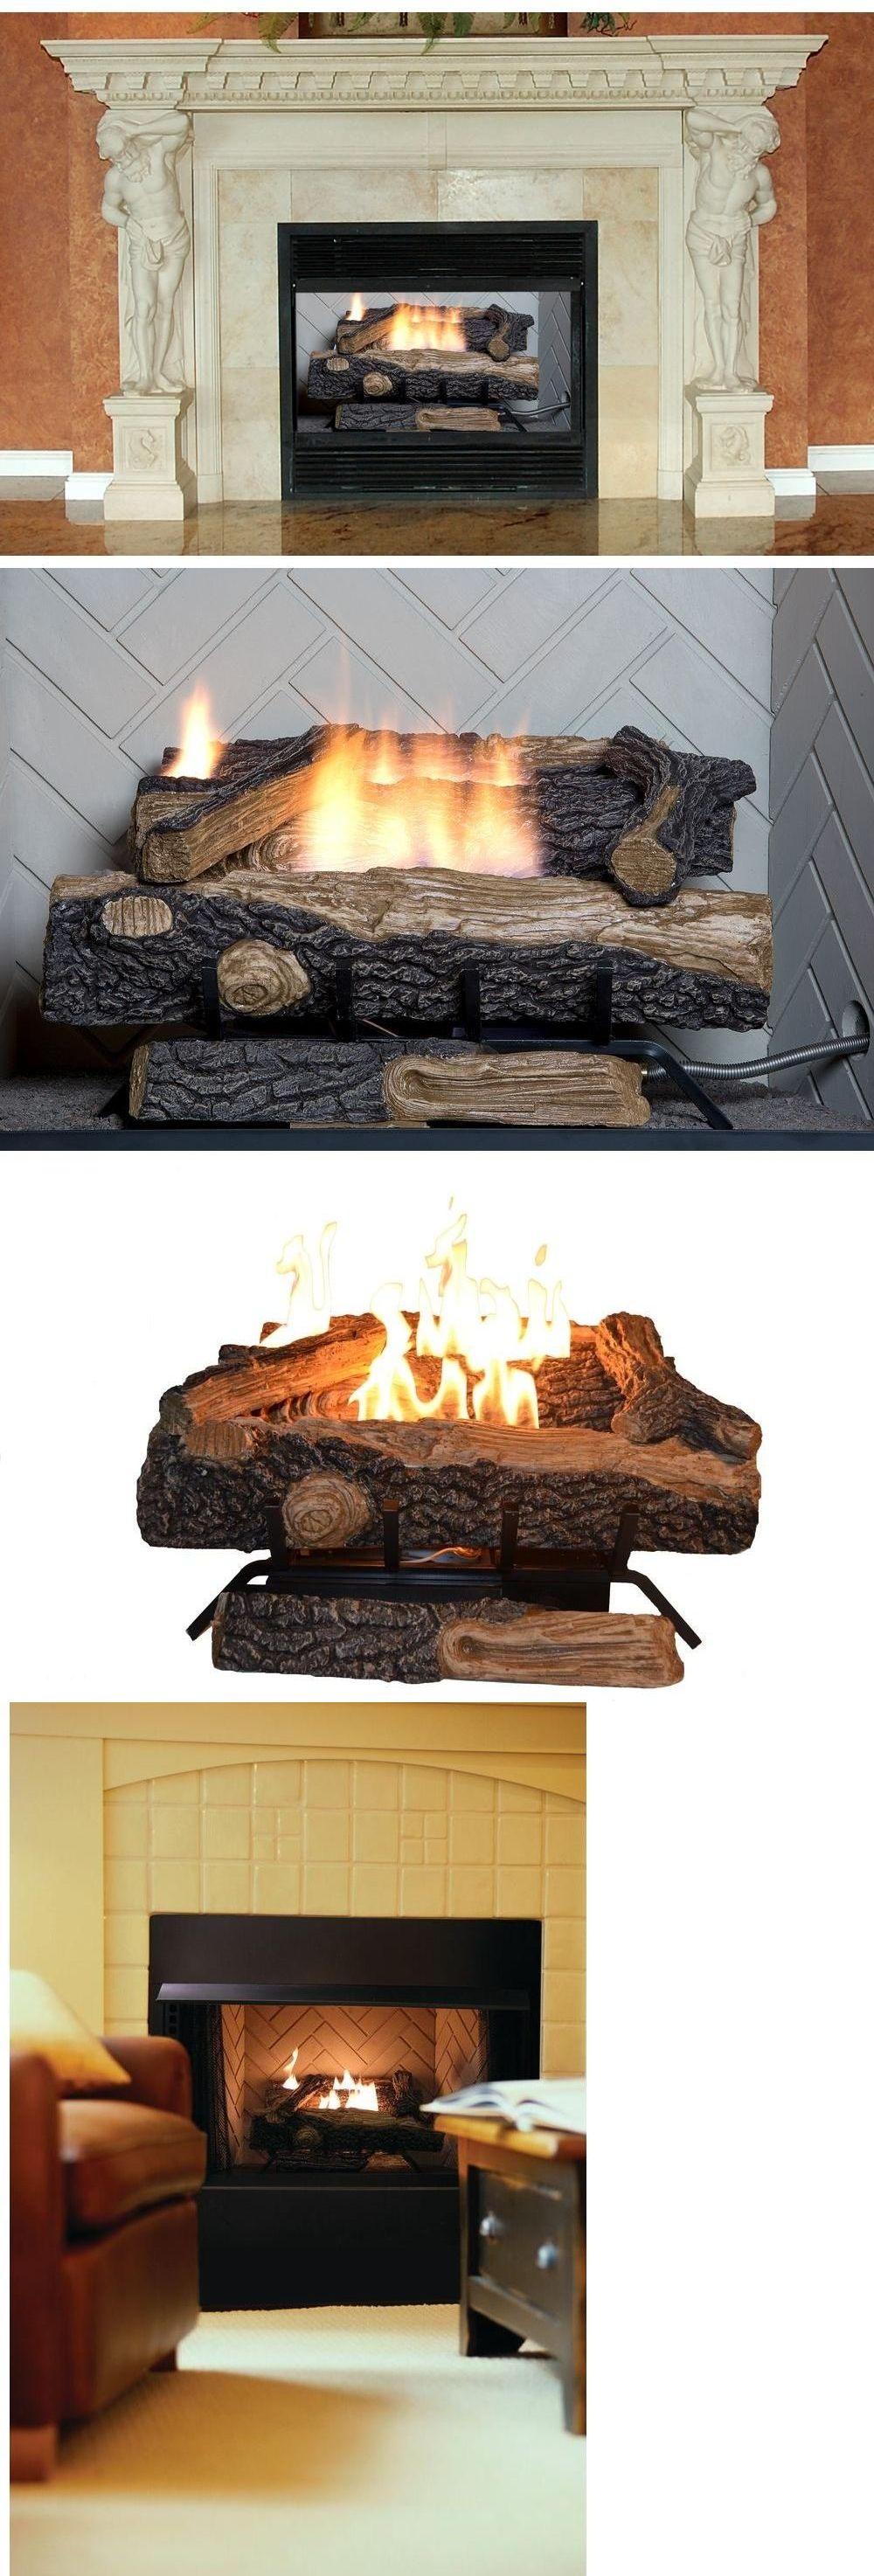 decorative logs stone and glass 38220 oakwood vent free propane gas